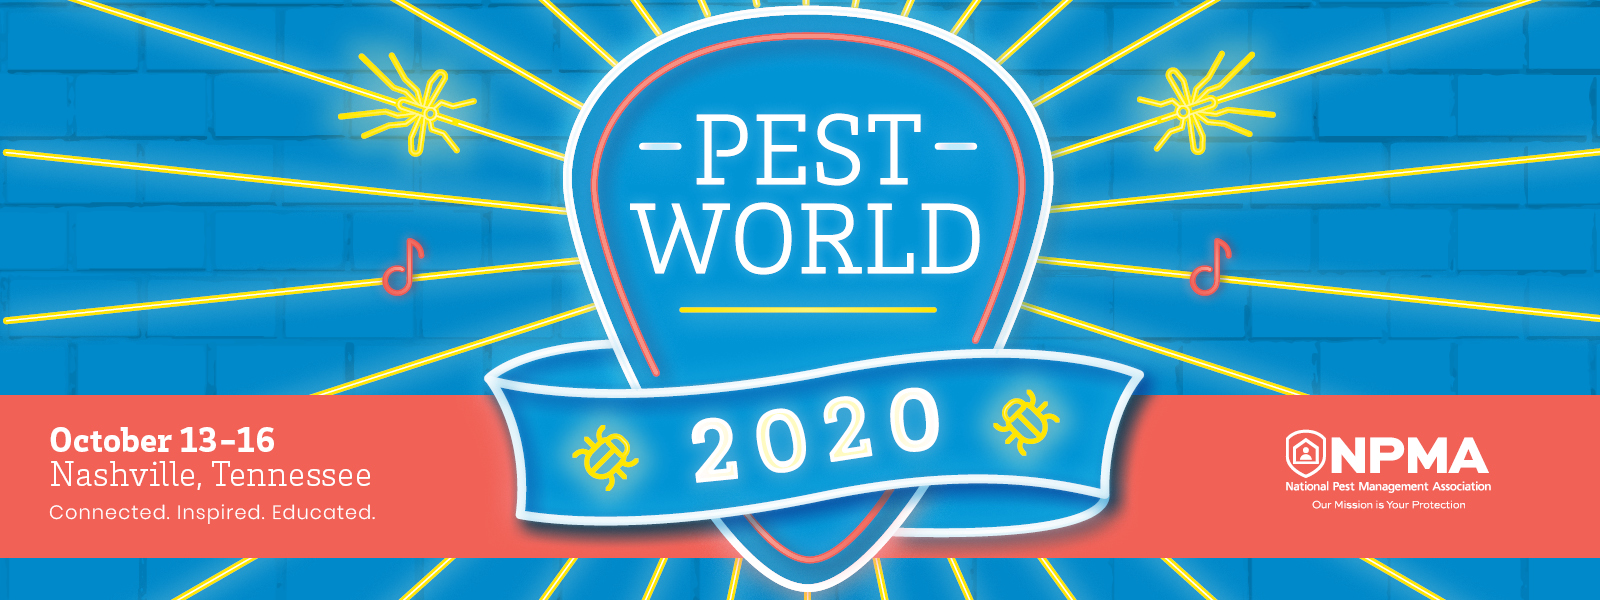 Pest World 2020